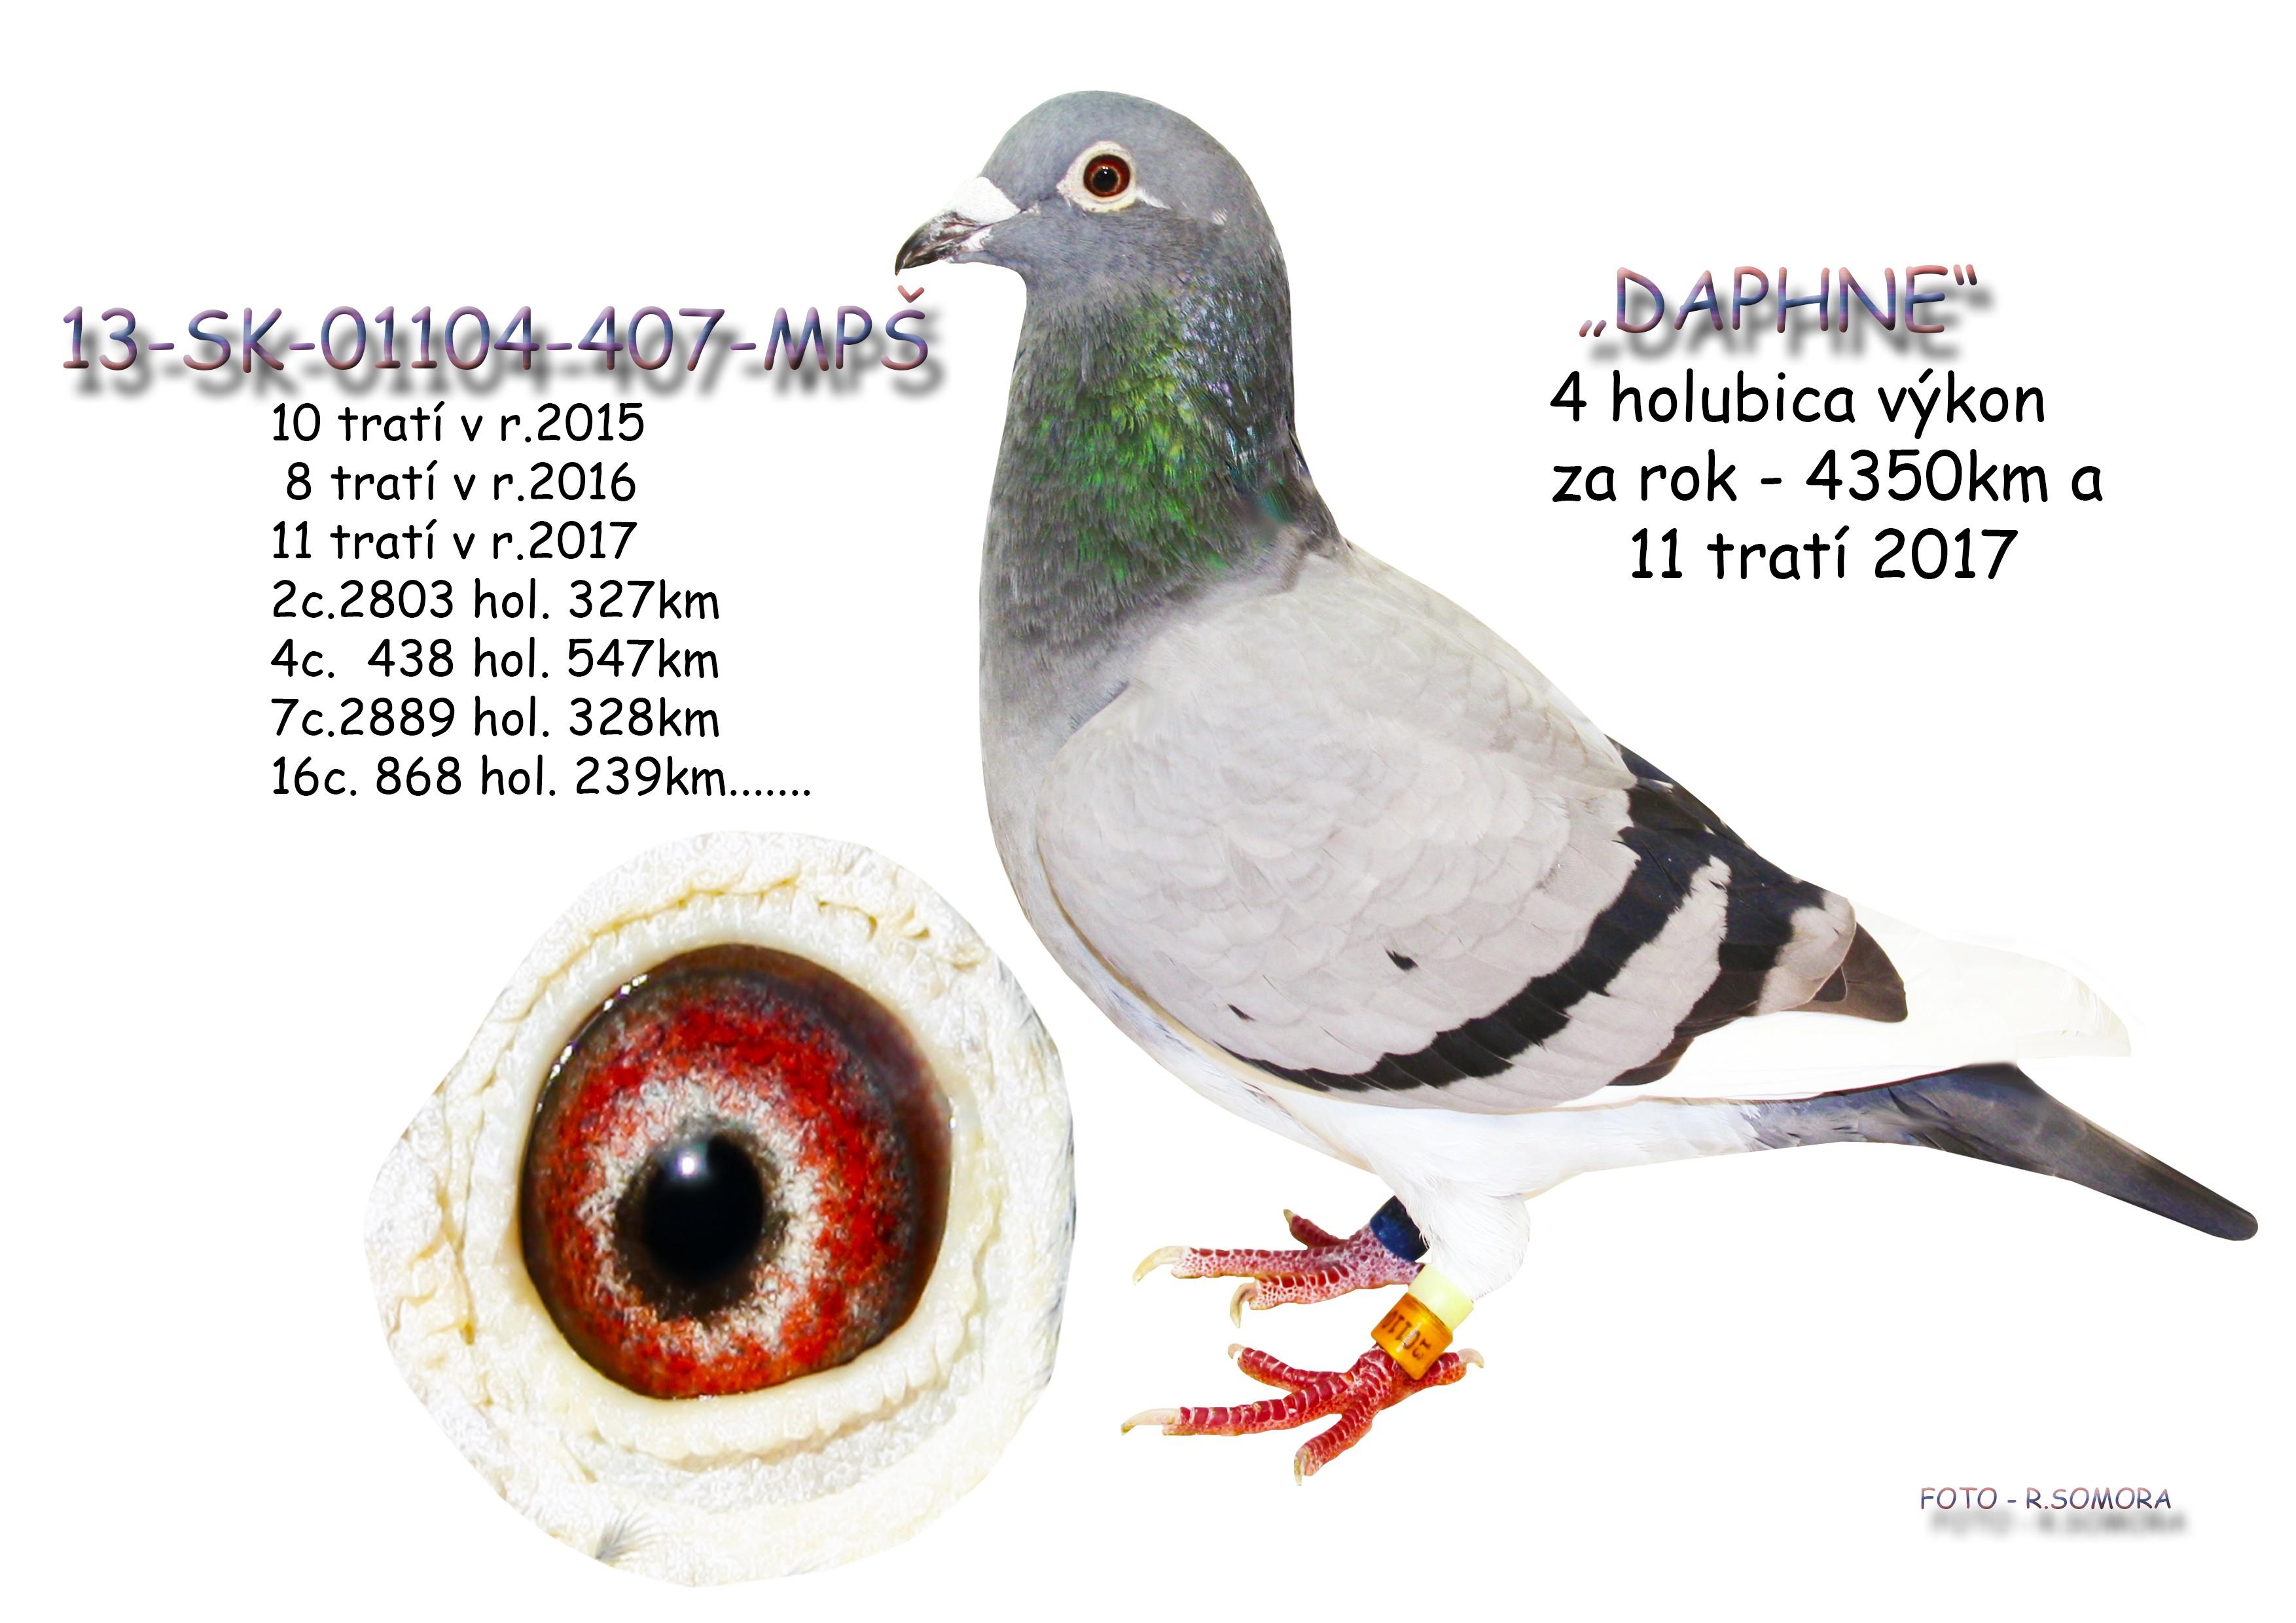 SK-2013-01104-407 - Somora Jozef+Rudolf